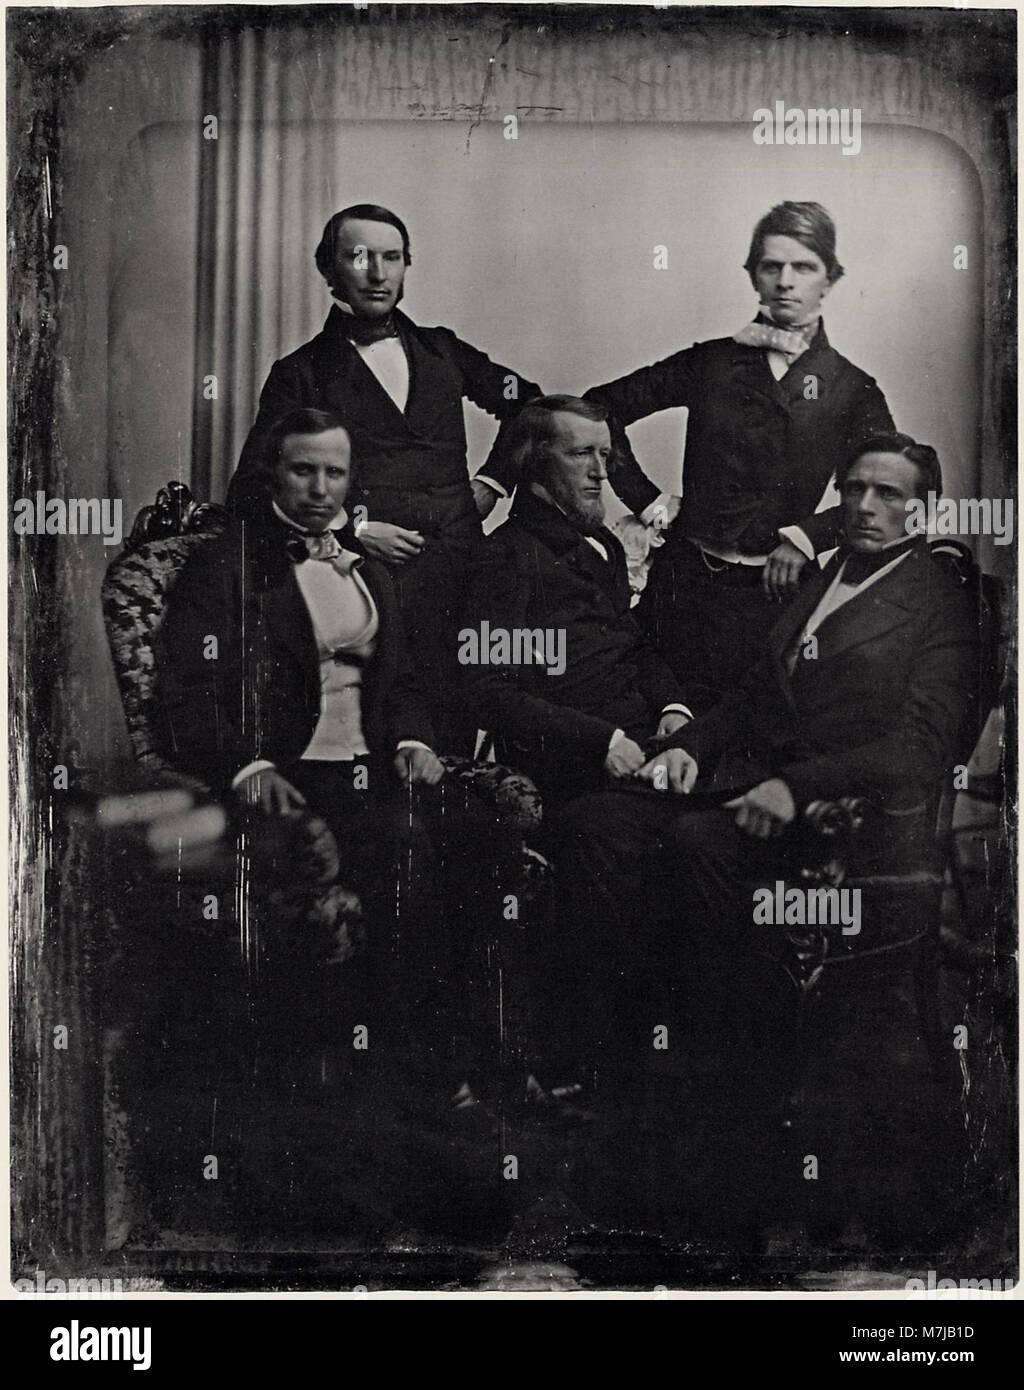 Southworth and Hawes - Die »Großgrundbesitzer« (Zeno Fotografie) Stock Photo